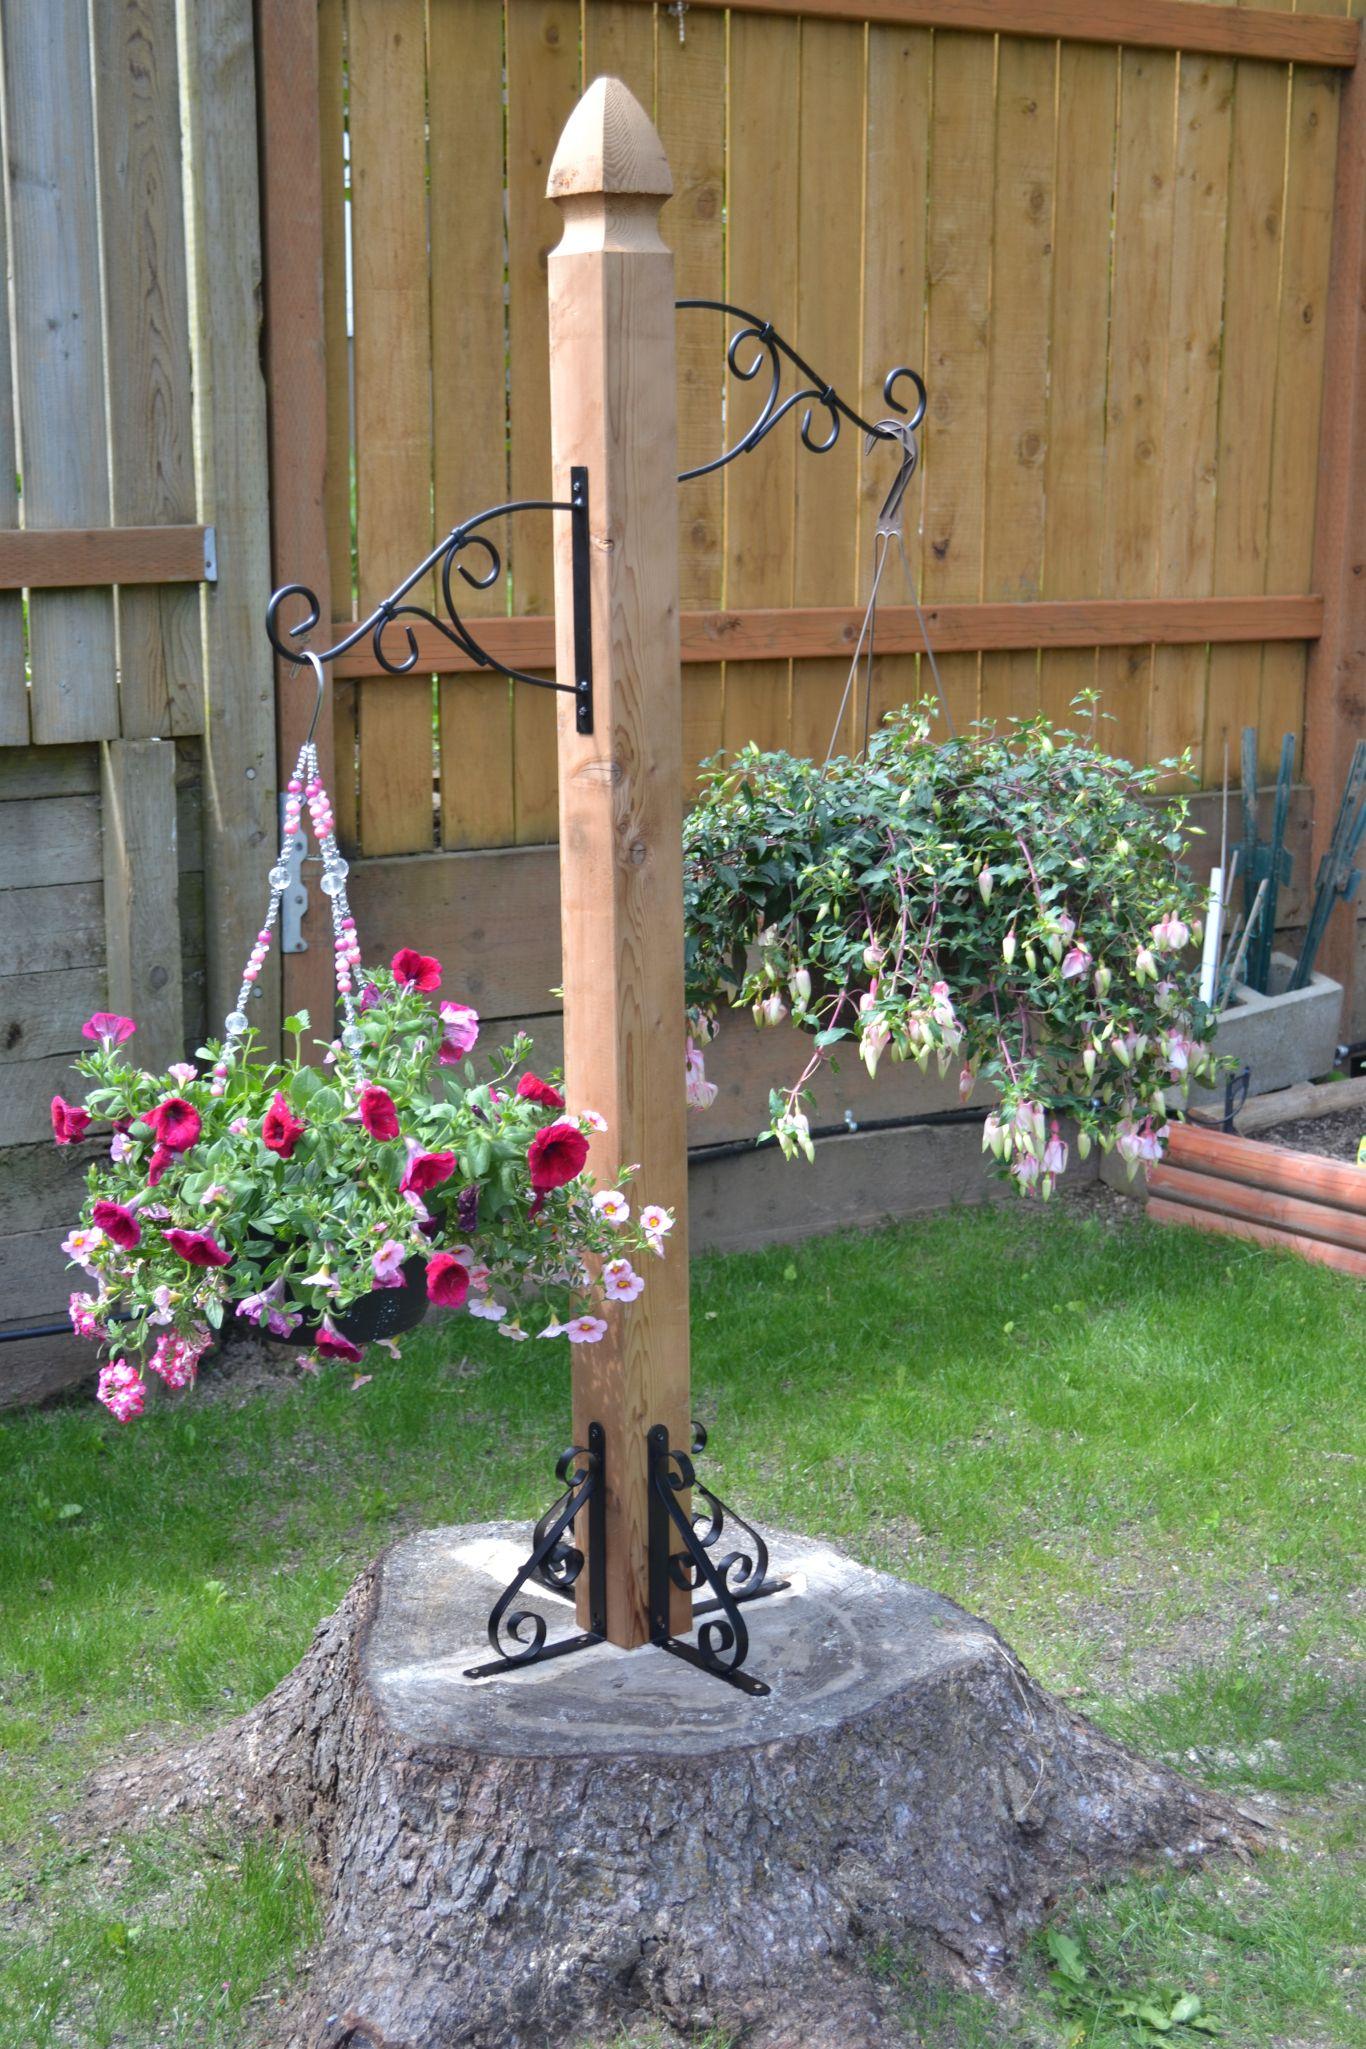 Tree Stump Hanging Basket Decoration Garden Yard Ideas